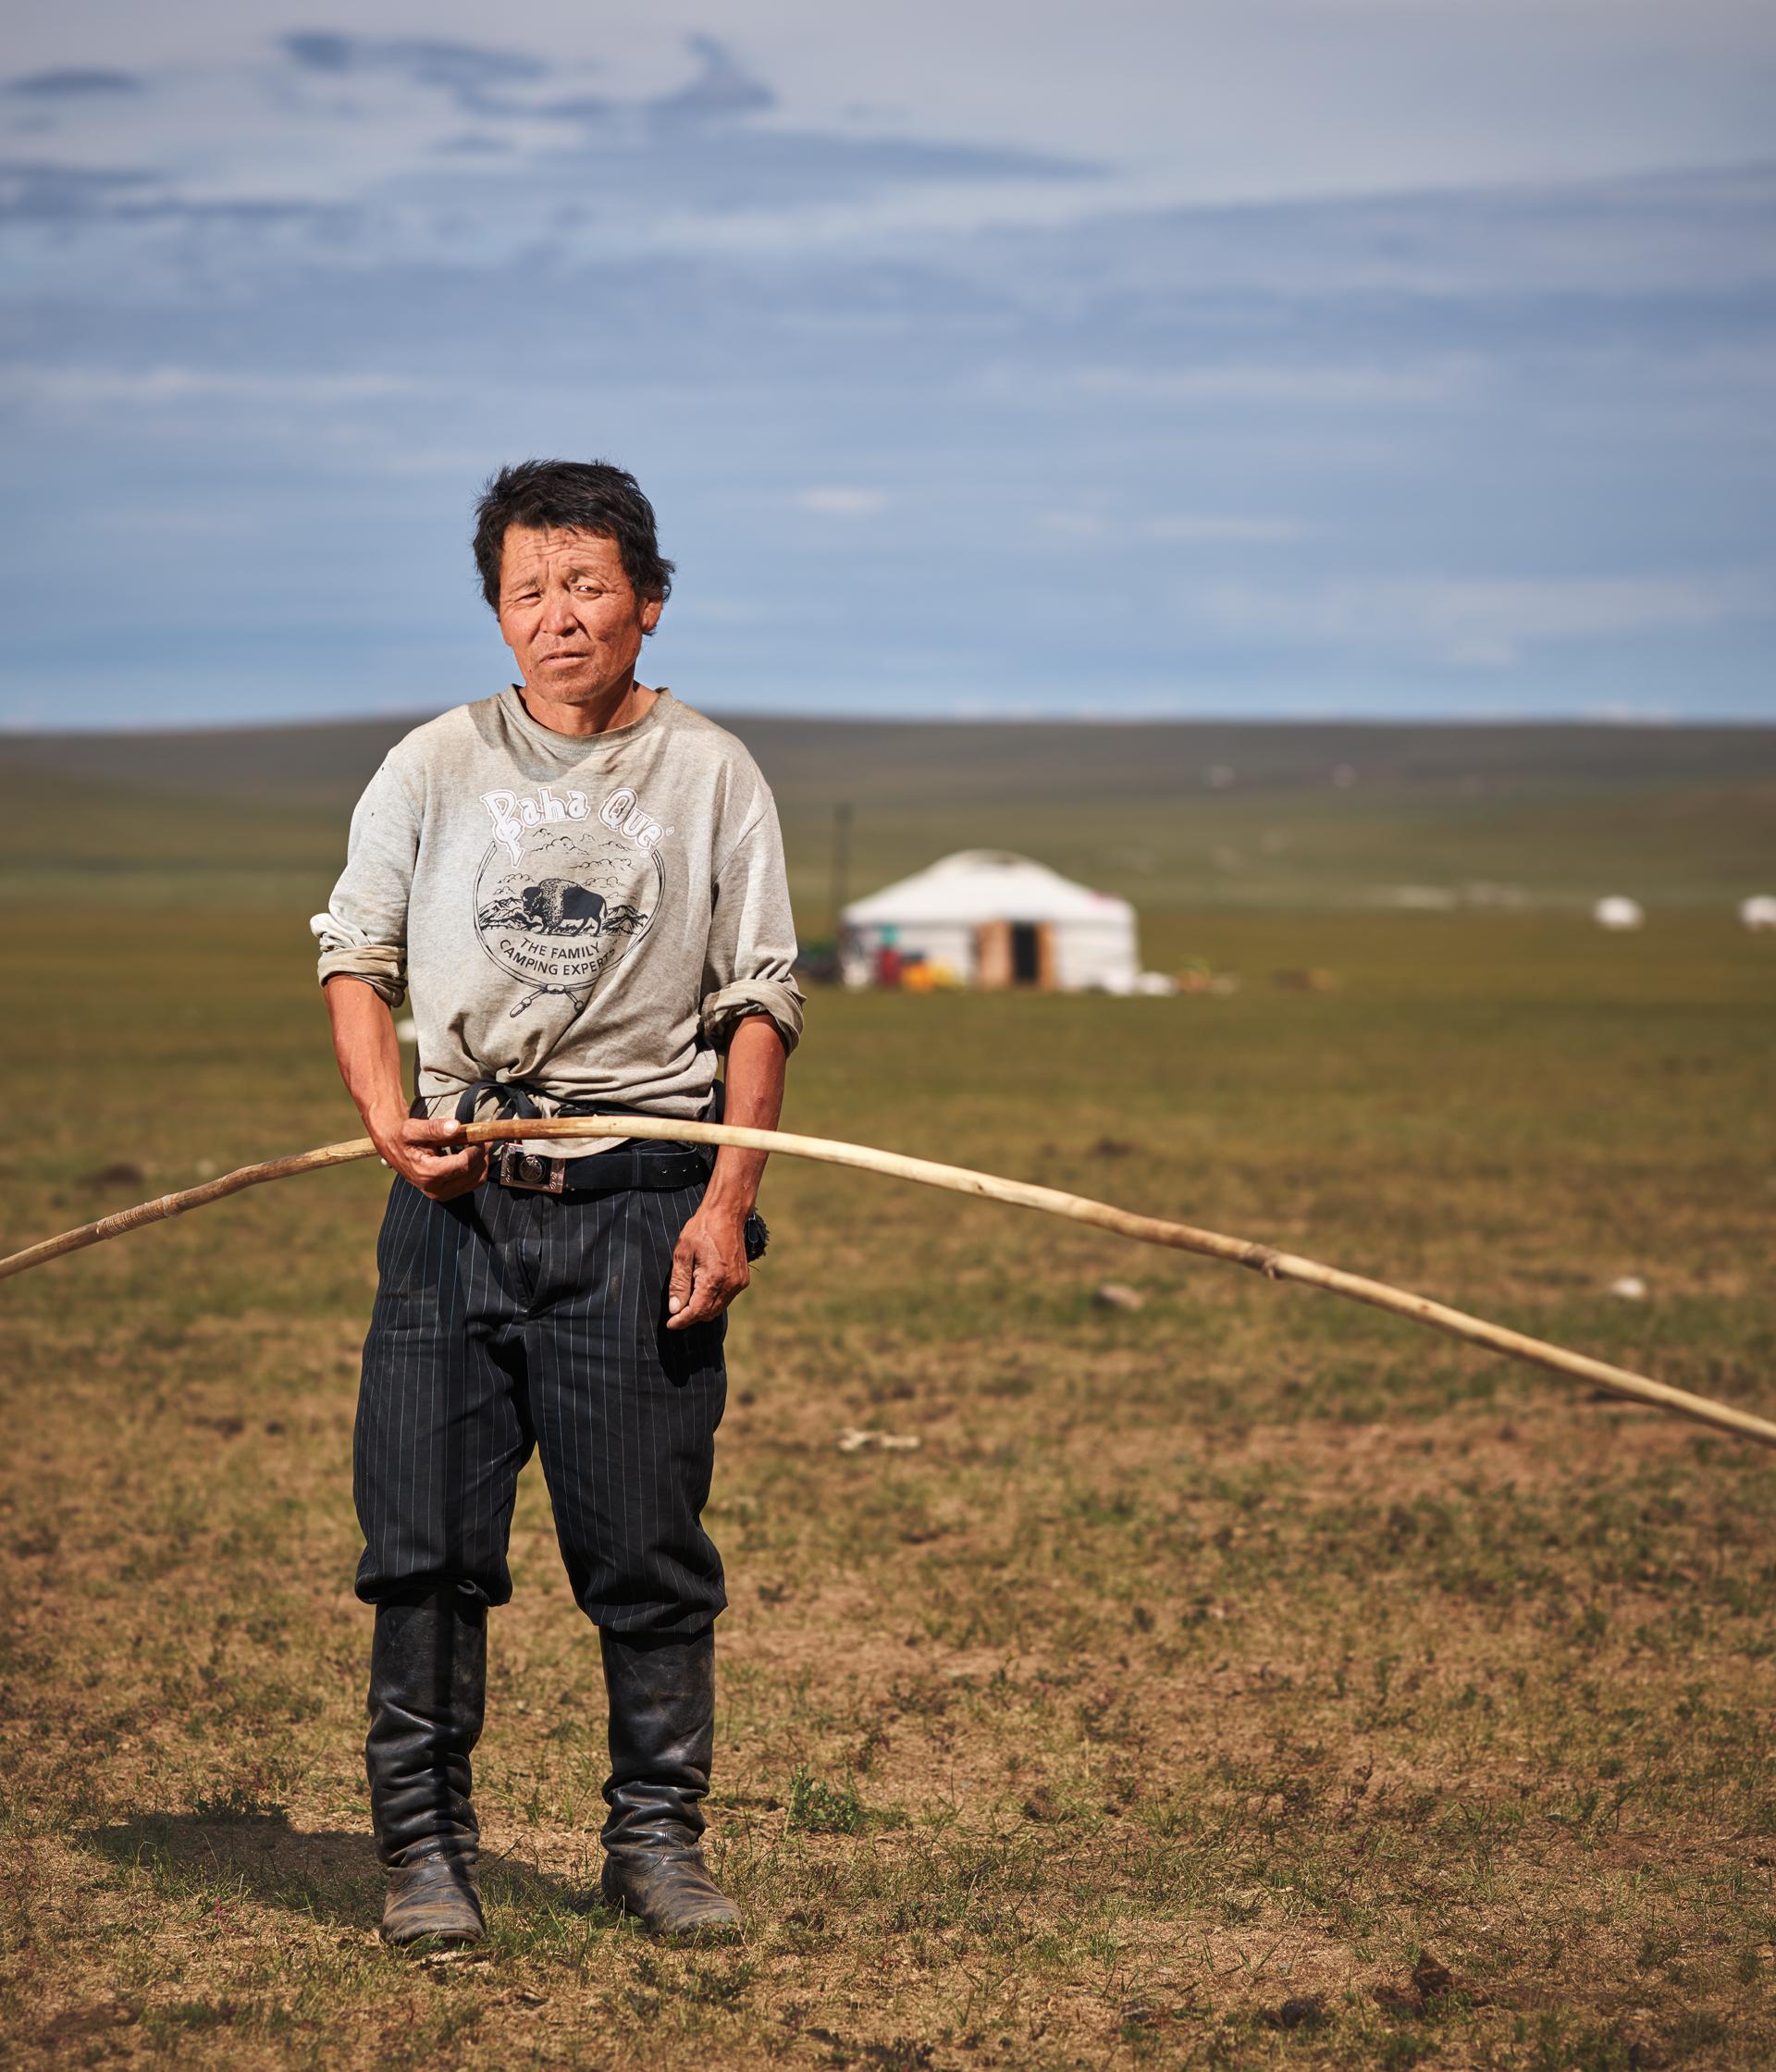 JPG (8-bit)-16_0813-Mongolia_PODAS-CF004531 copy.jpg